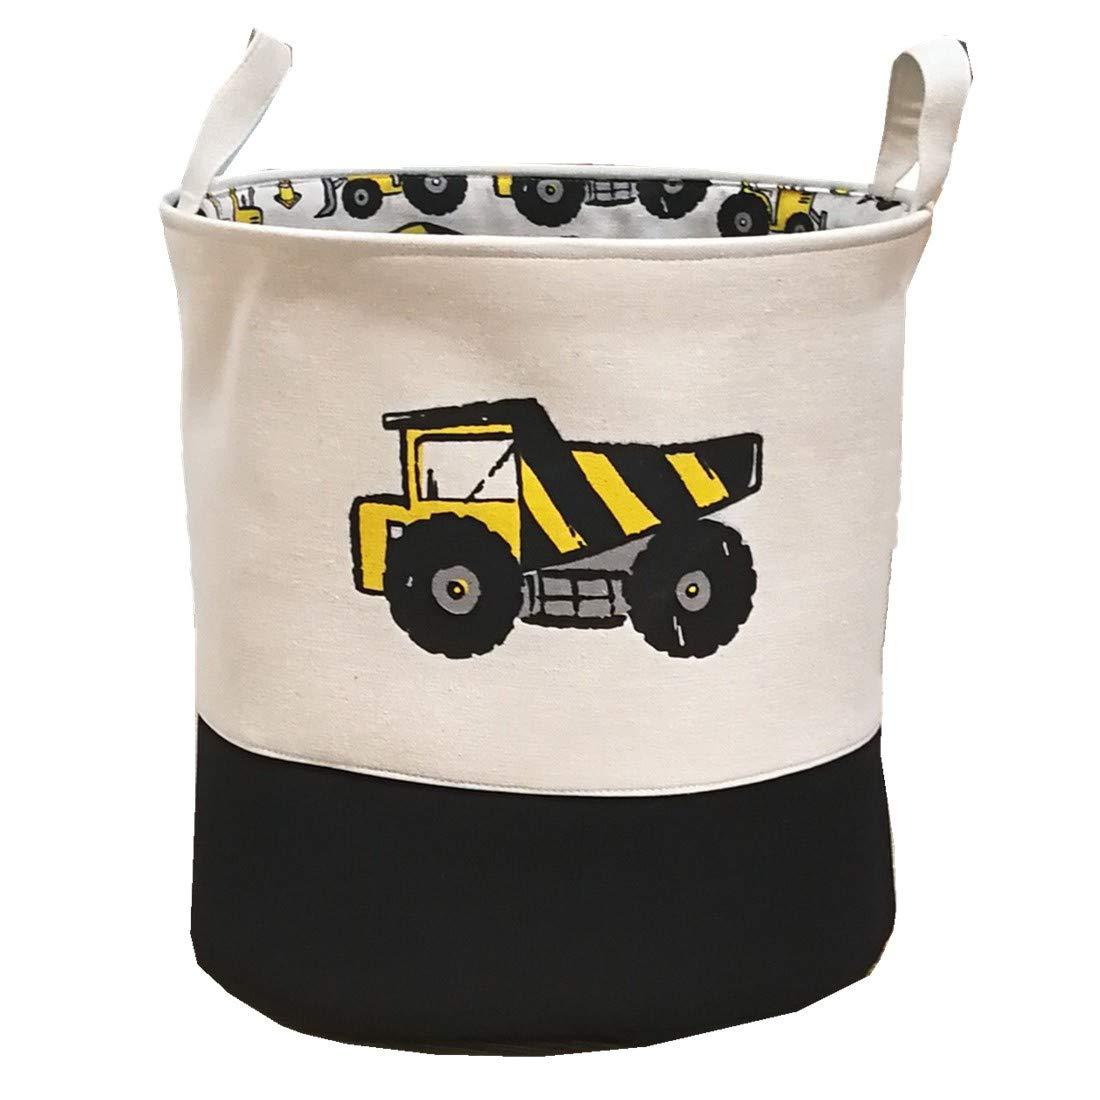 Cotton Cartoon Cute Toy Storage Bins Kids Laundry Basket Nursery Hamper with Handle Toy Box//Toy Organizer for Boys and Girls Medium Size Storage Baskets Kids Balloon